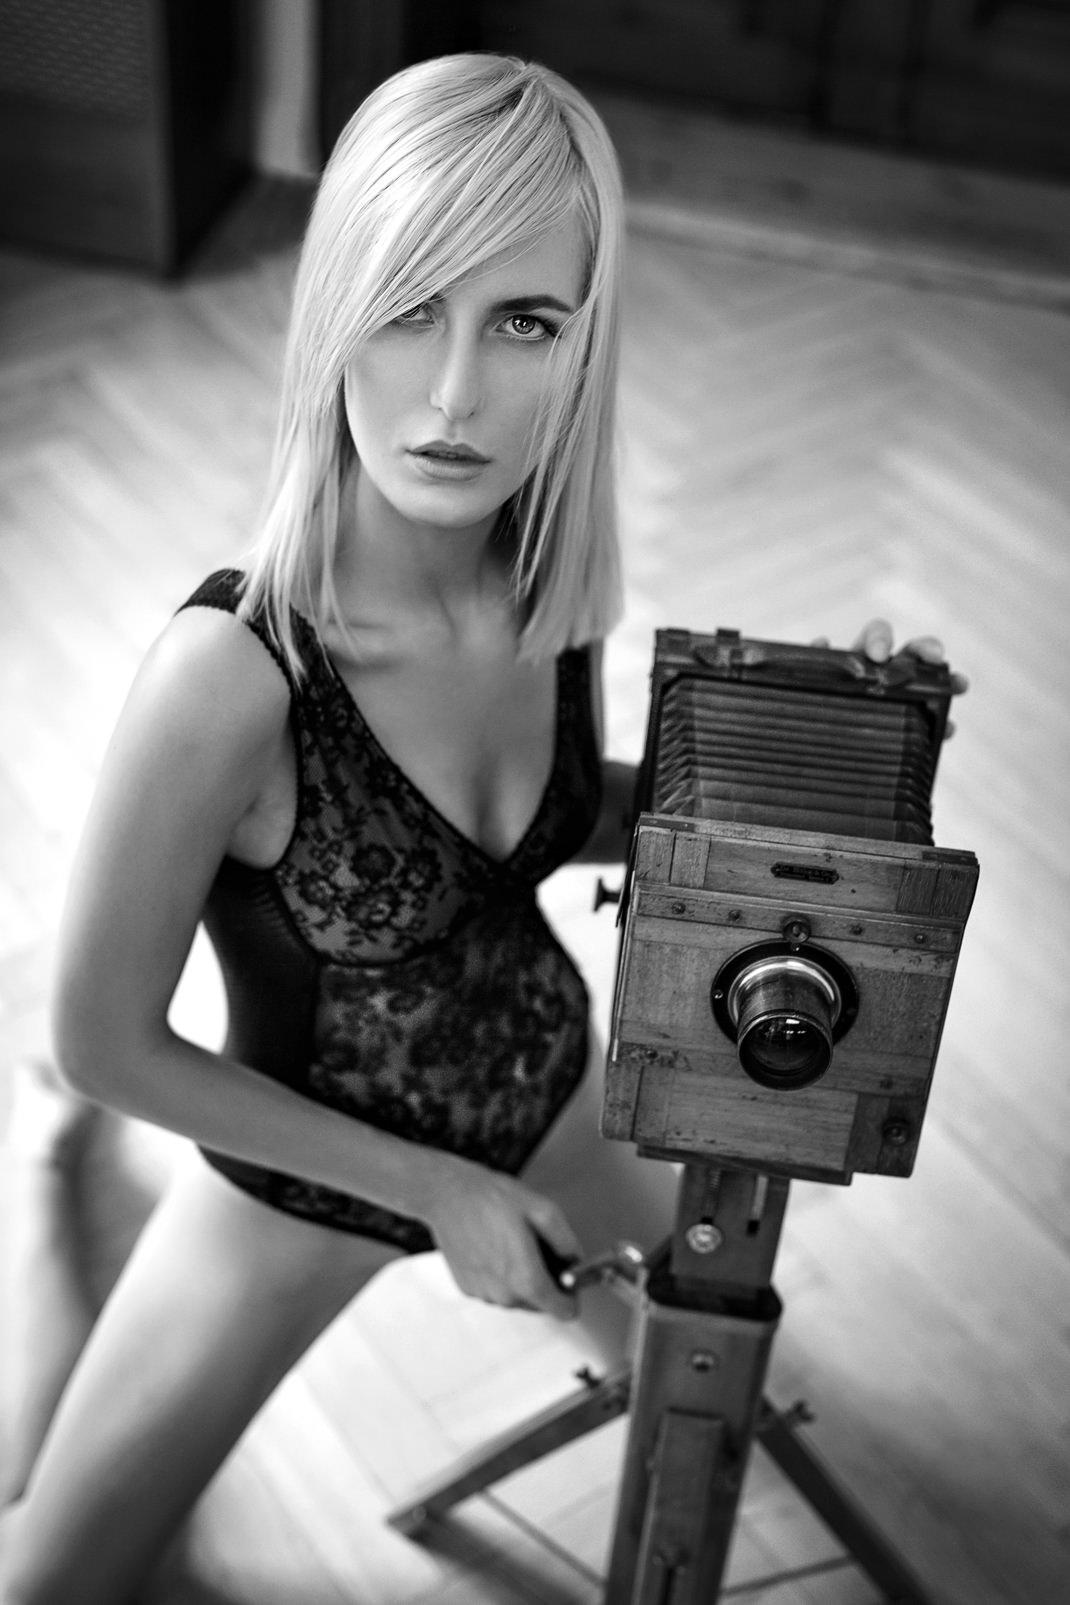 Two Beauties - Rosmarie & Dr. Höhn & Co Tropical Camera - Markus Hertzsch - Camera - Girl